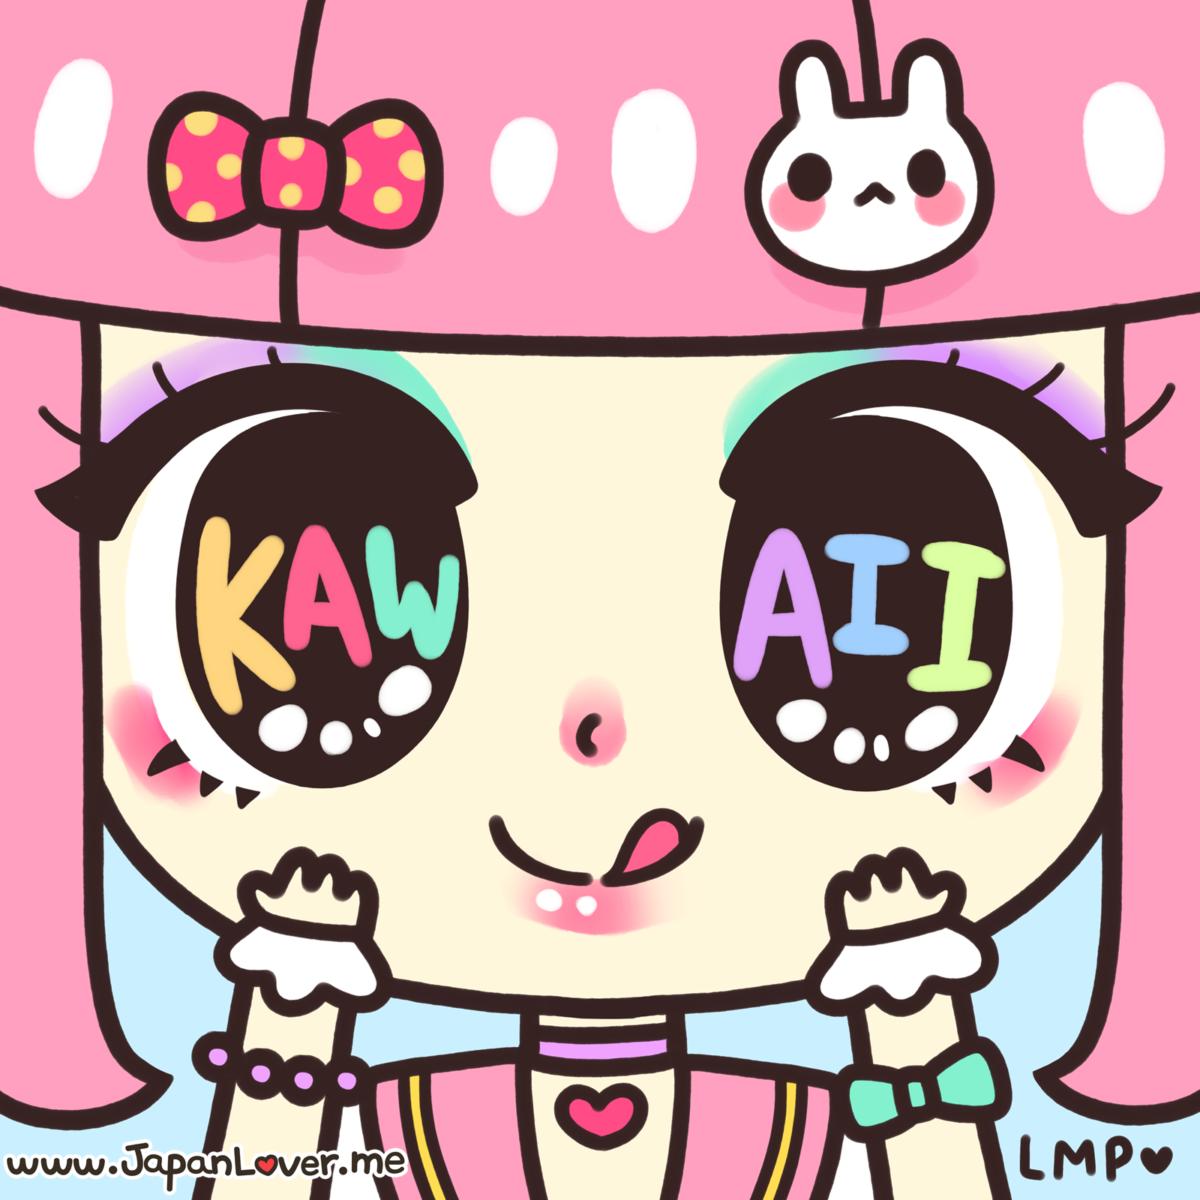 kawaii-months-2014-ppa